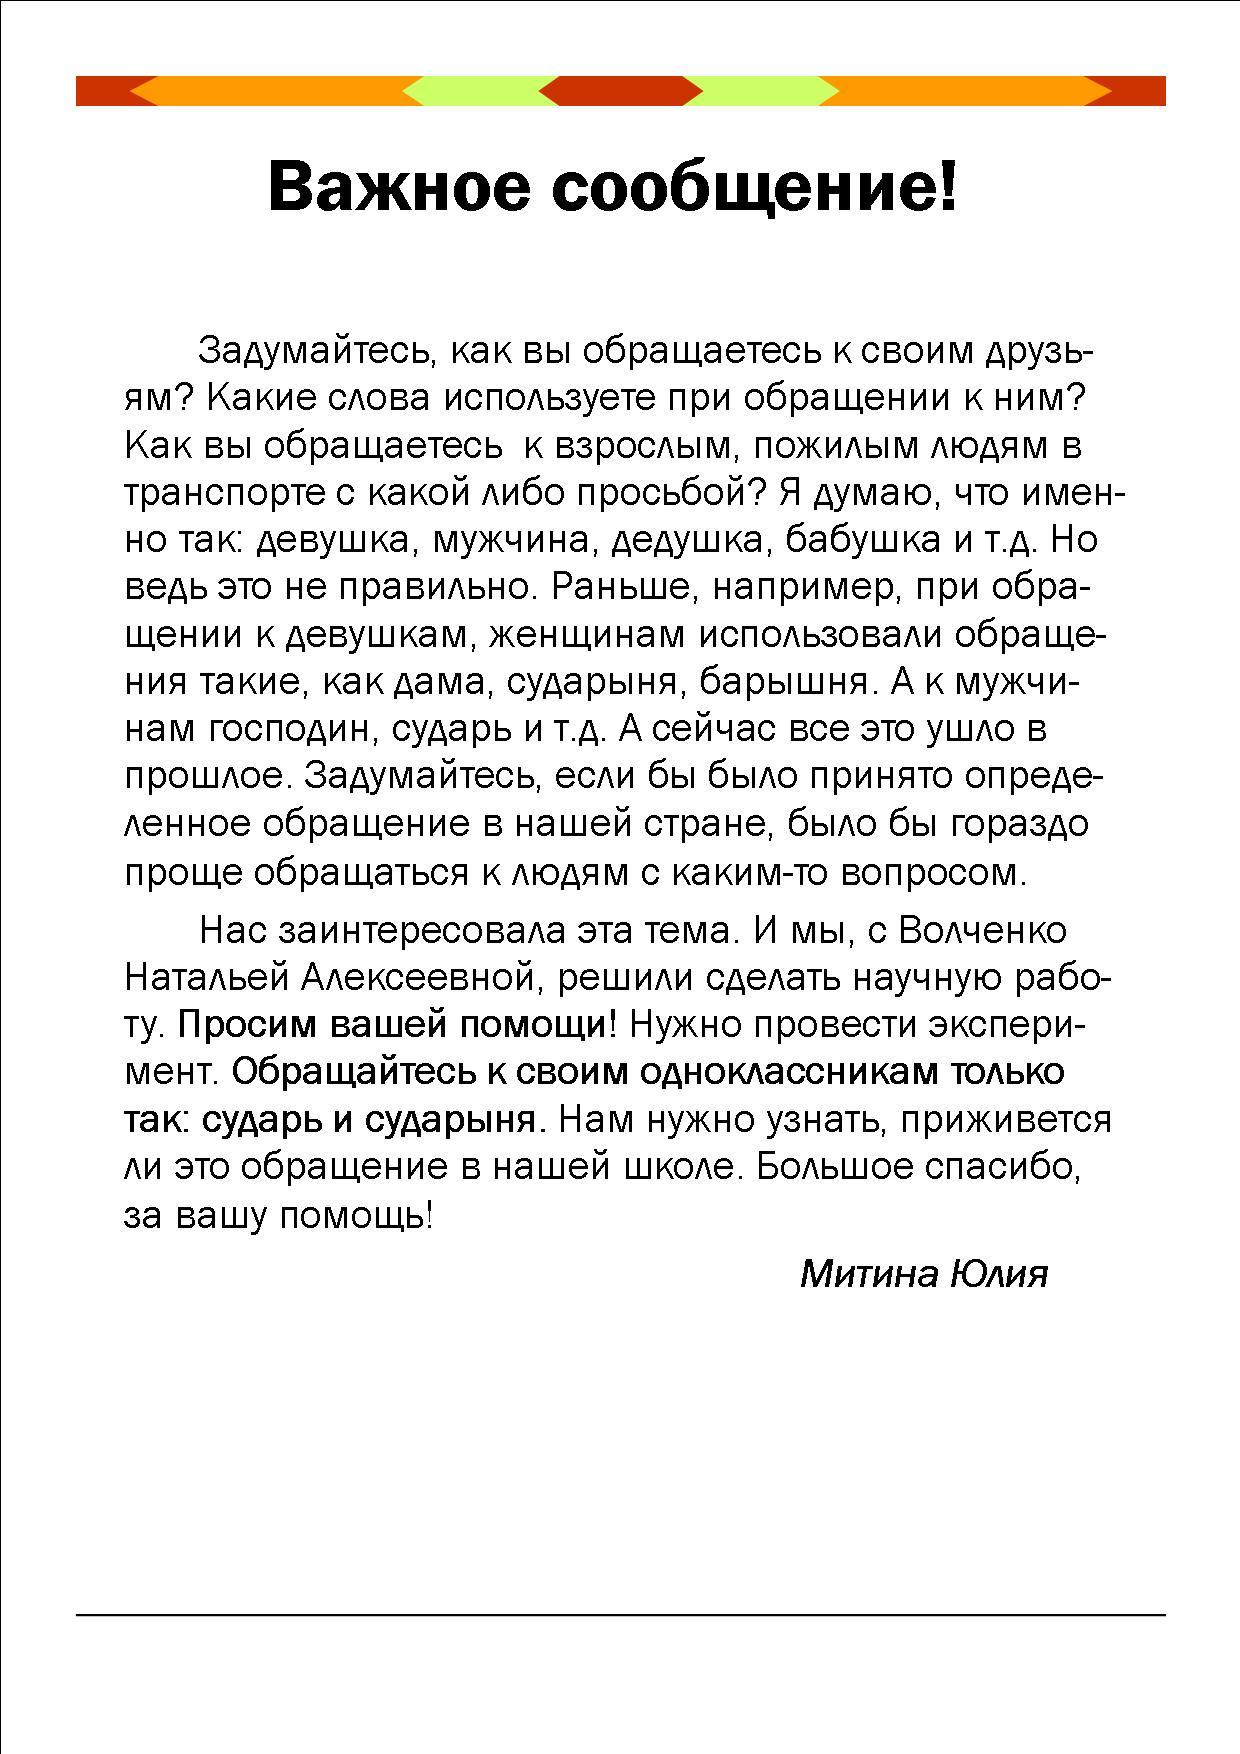 C:\Documents and Settings\Виктор\Рабочий стол\ШКОЛЬНАЯ ГАЗЕТА\октябрь 2014.jpg